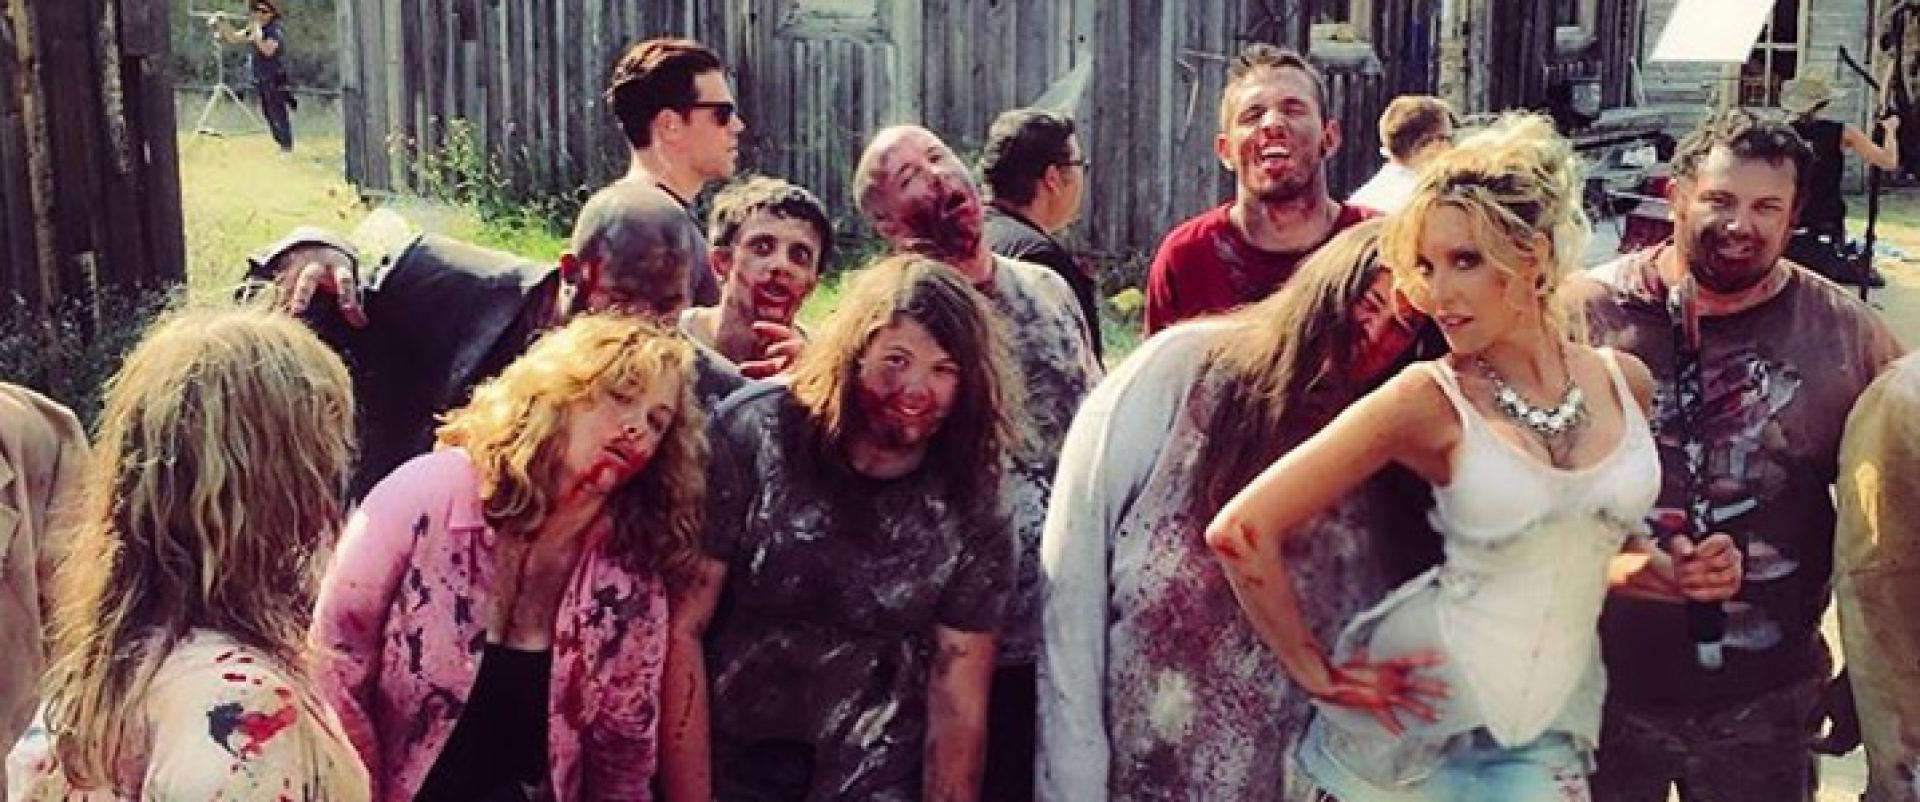 Dead 7: Nick Carterék futurisztikus zombiwesternje képekben